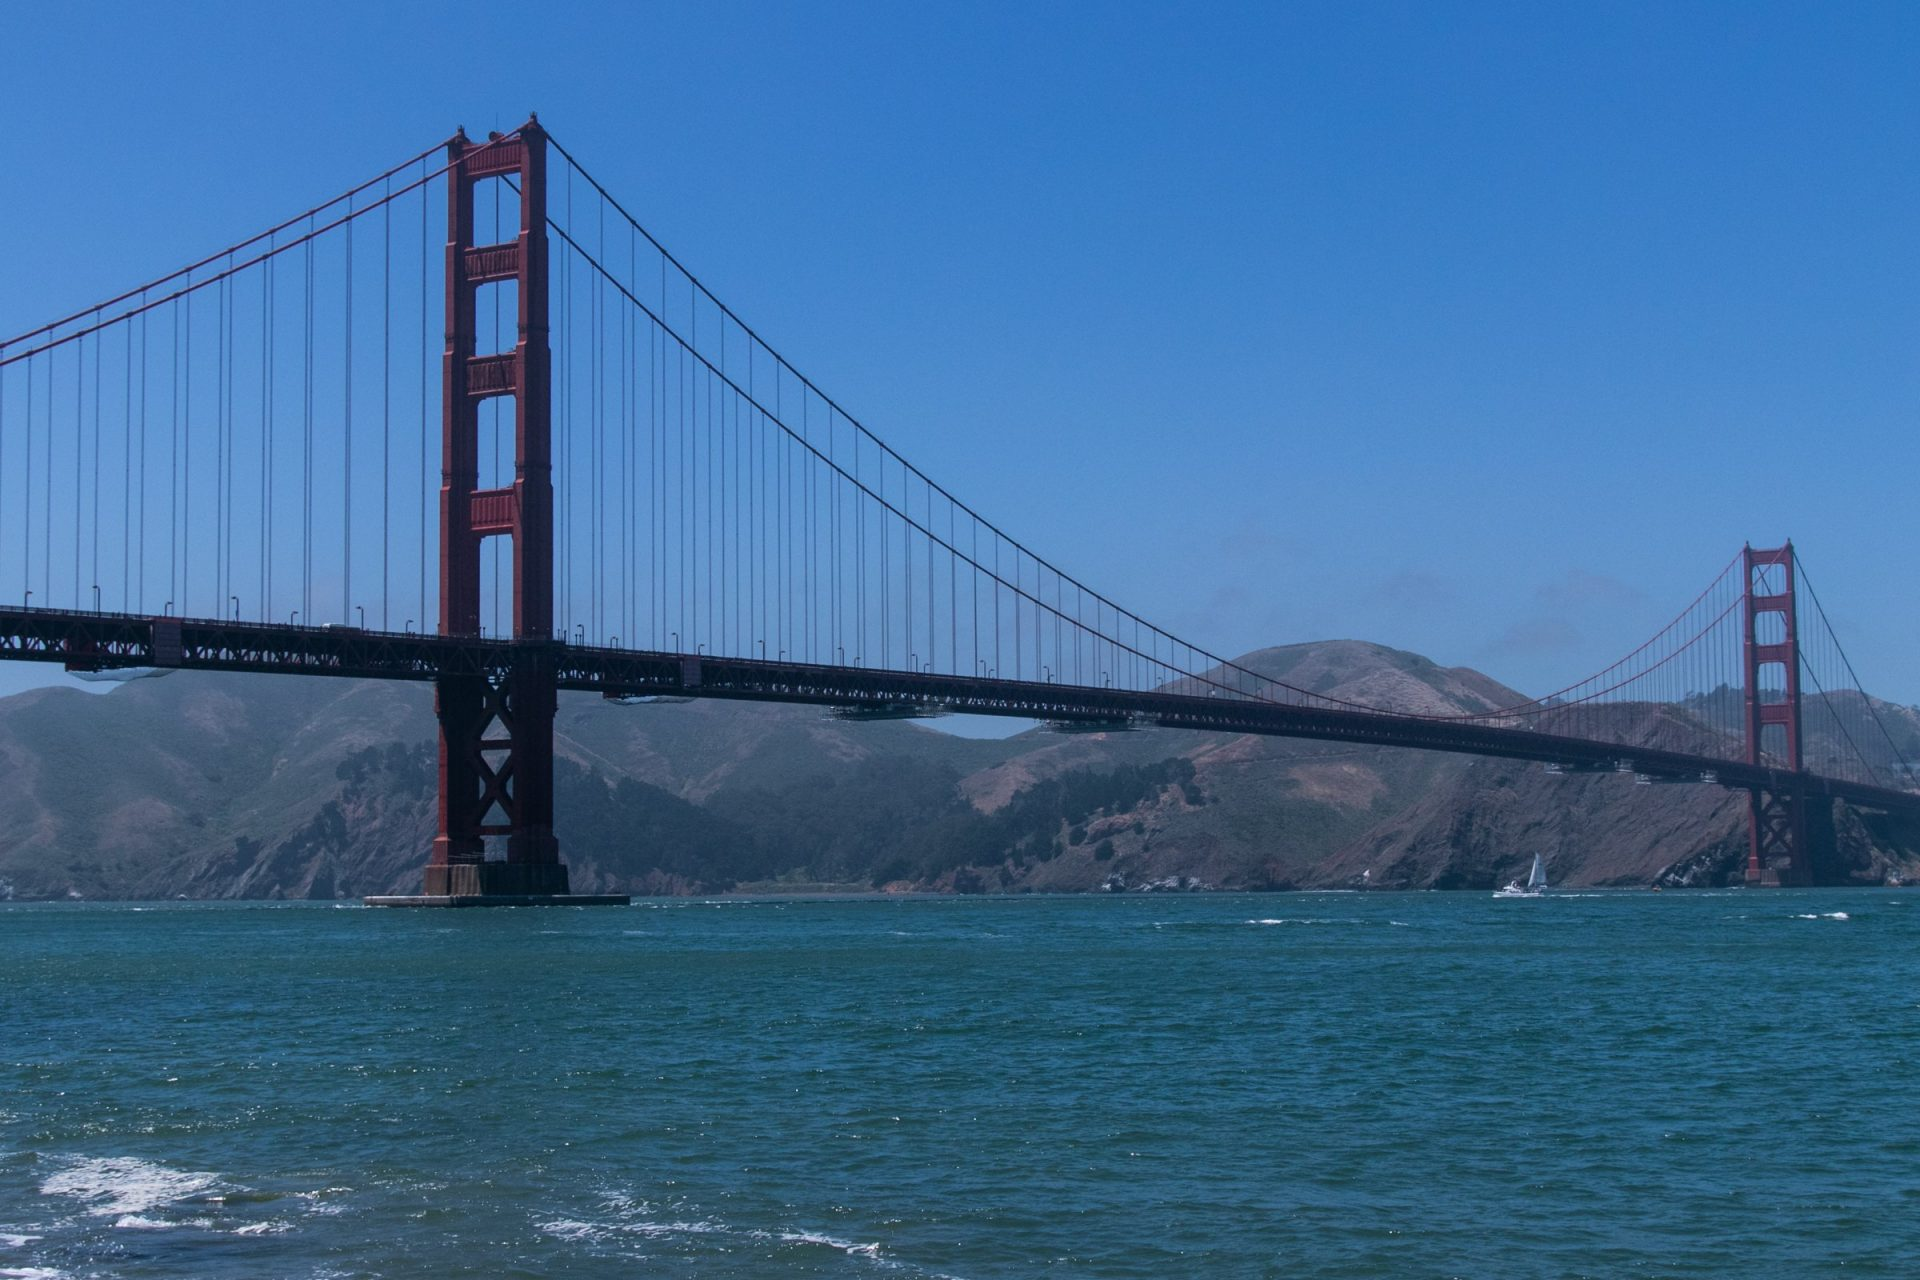 Hills Behind Towers Of Golden Gate Bridge